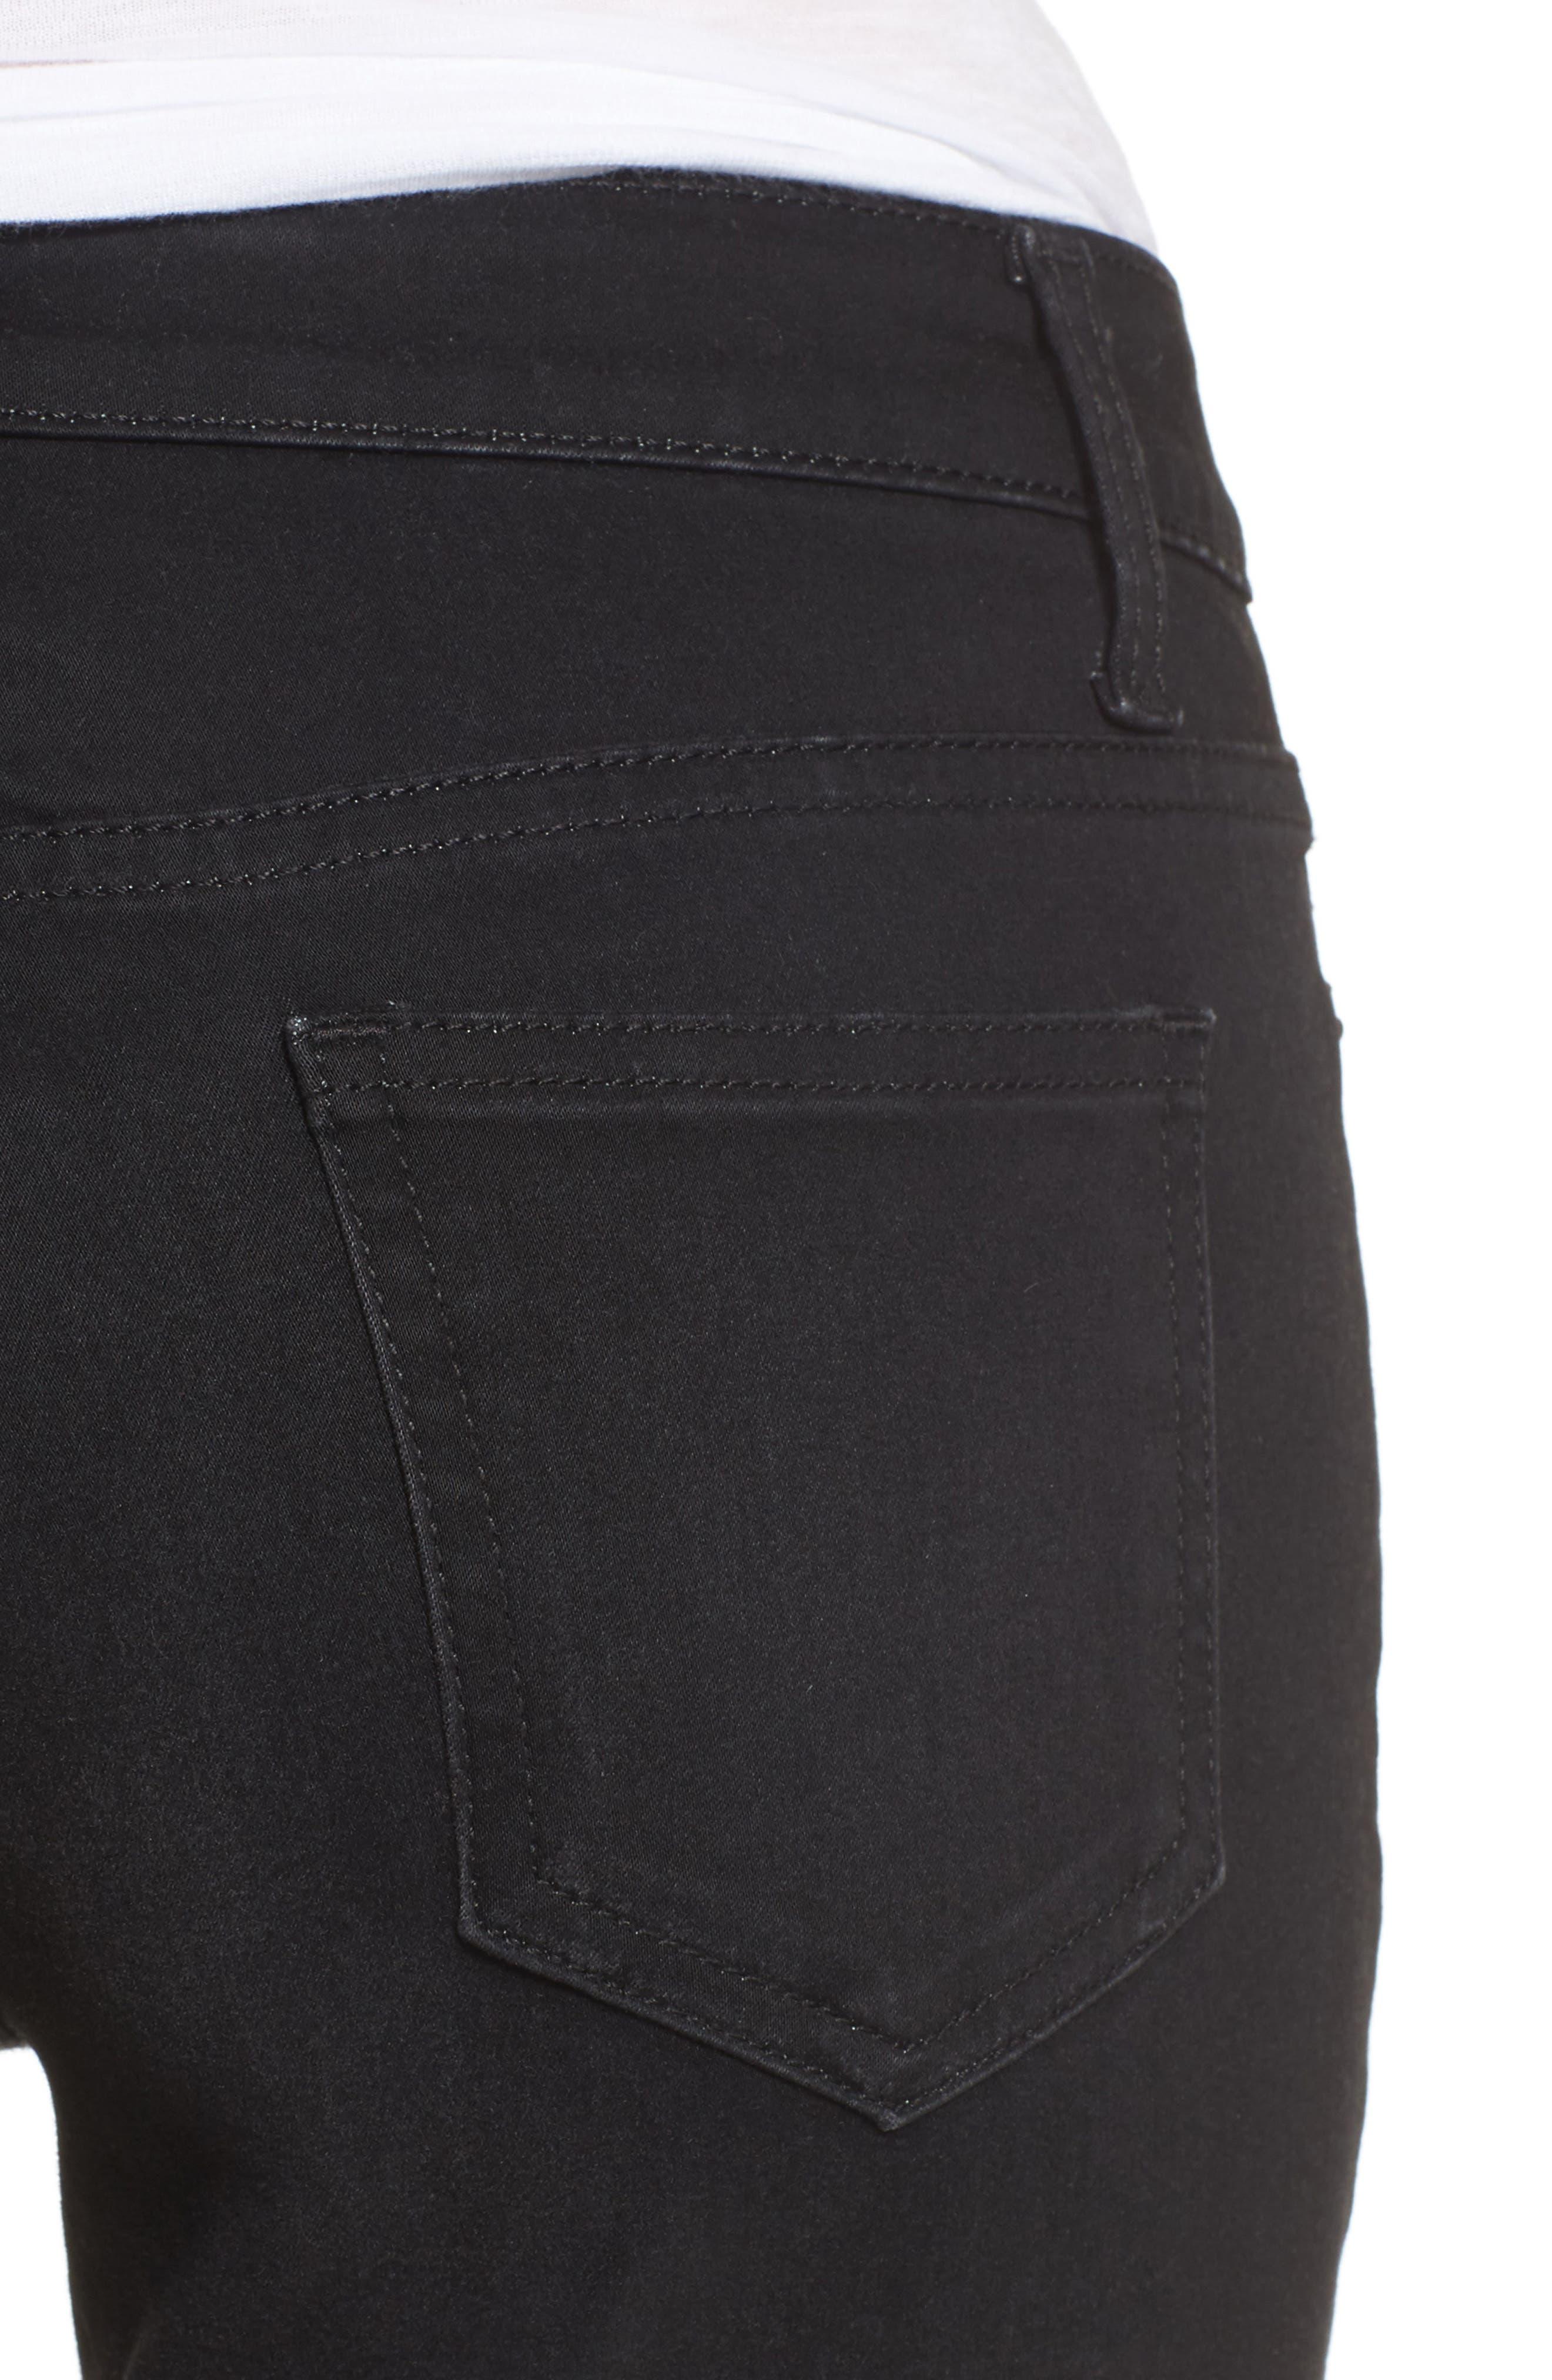 Alternate Image 4  - KUT from the Kloth Mia Curvy Fit Skinny Jeans (Regular & Petite)